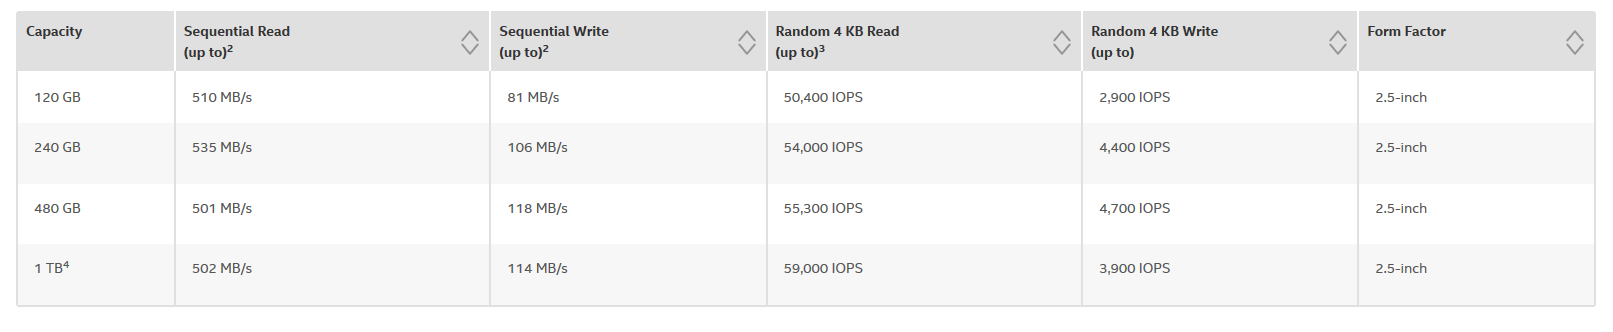 Intel SSD S3100 спецификации